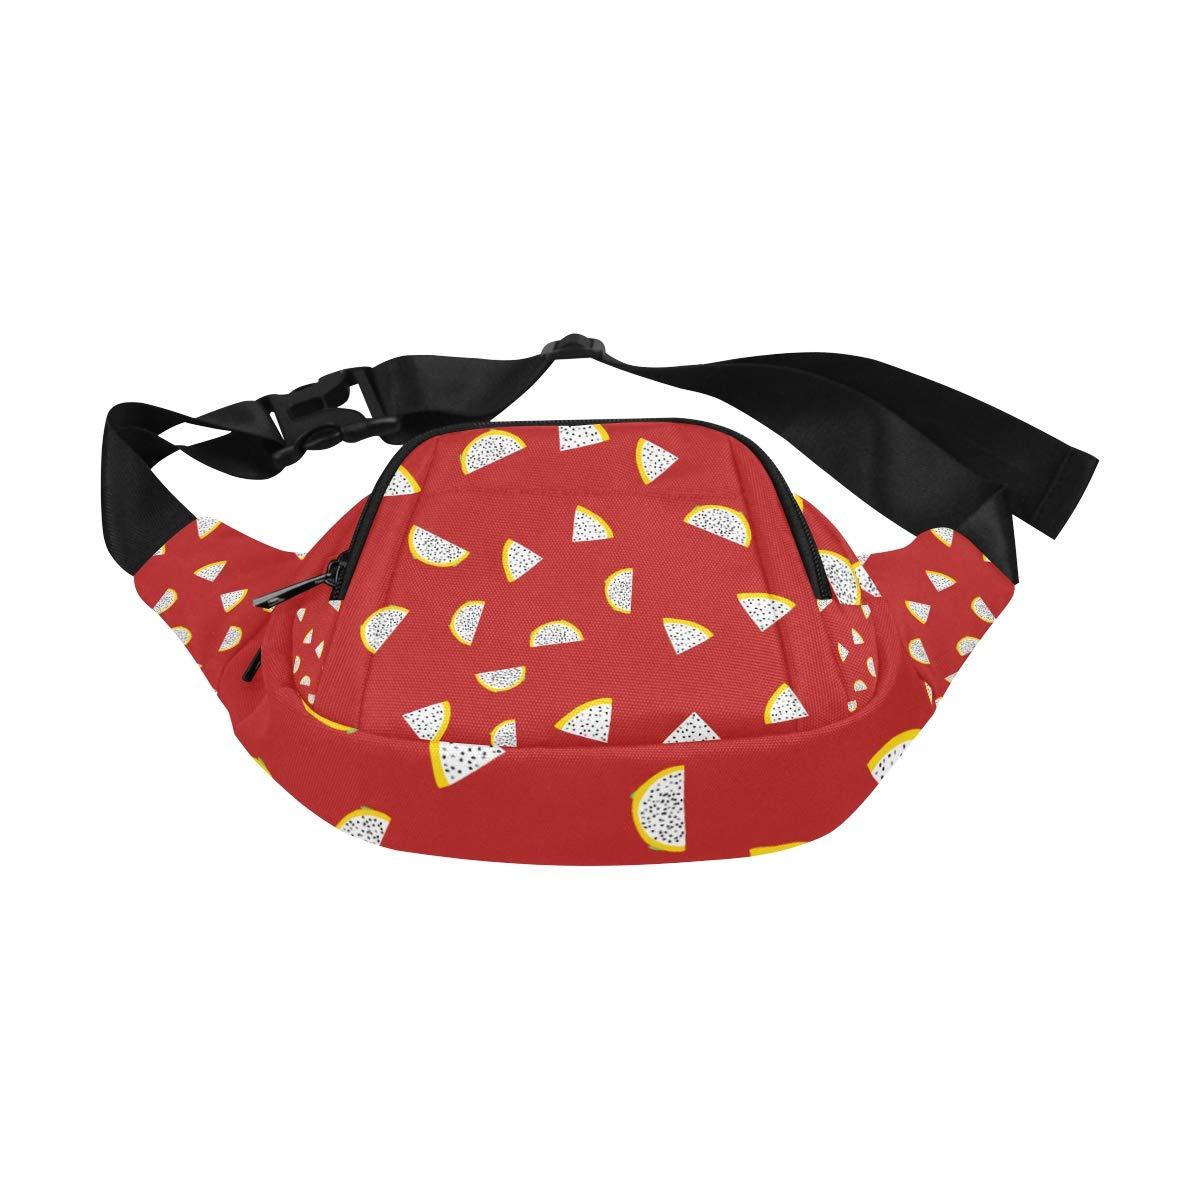 Hand Drawn Watercolor Dragon Fruits Fenny Packs Waist Bags Adjustable Belt Waterproof Nylon Travel Running Sport Vacation Party For Men Women Boys Girls Kids